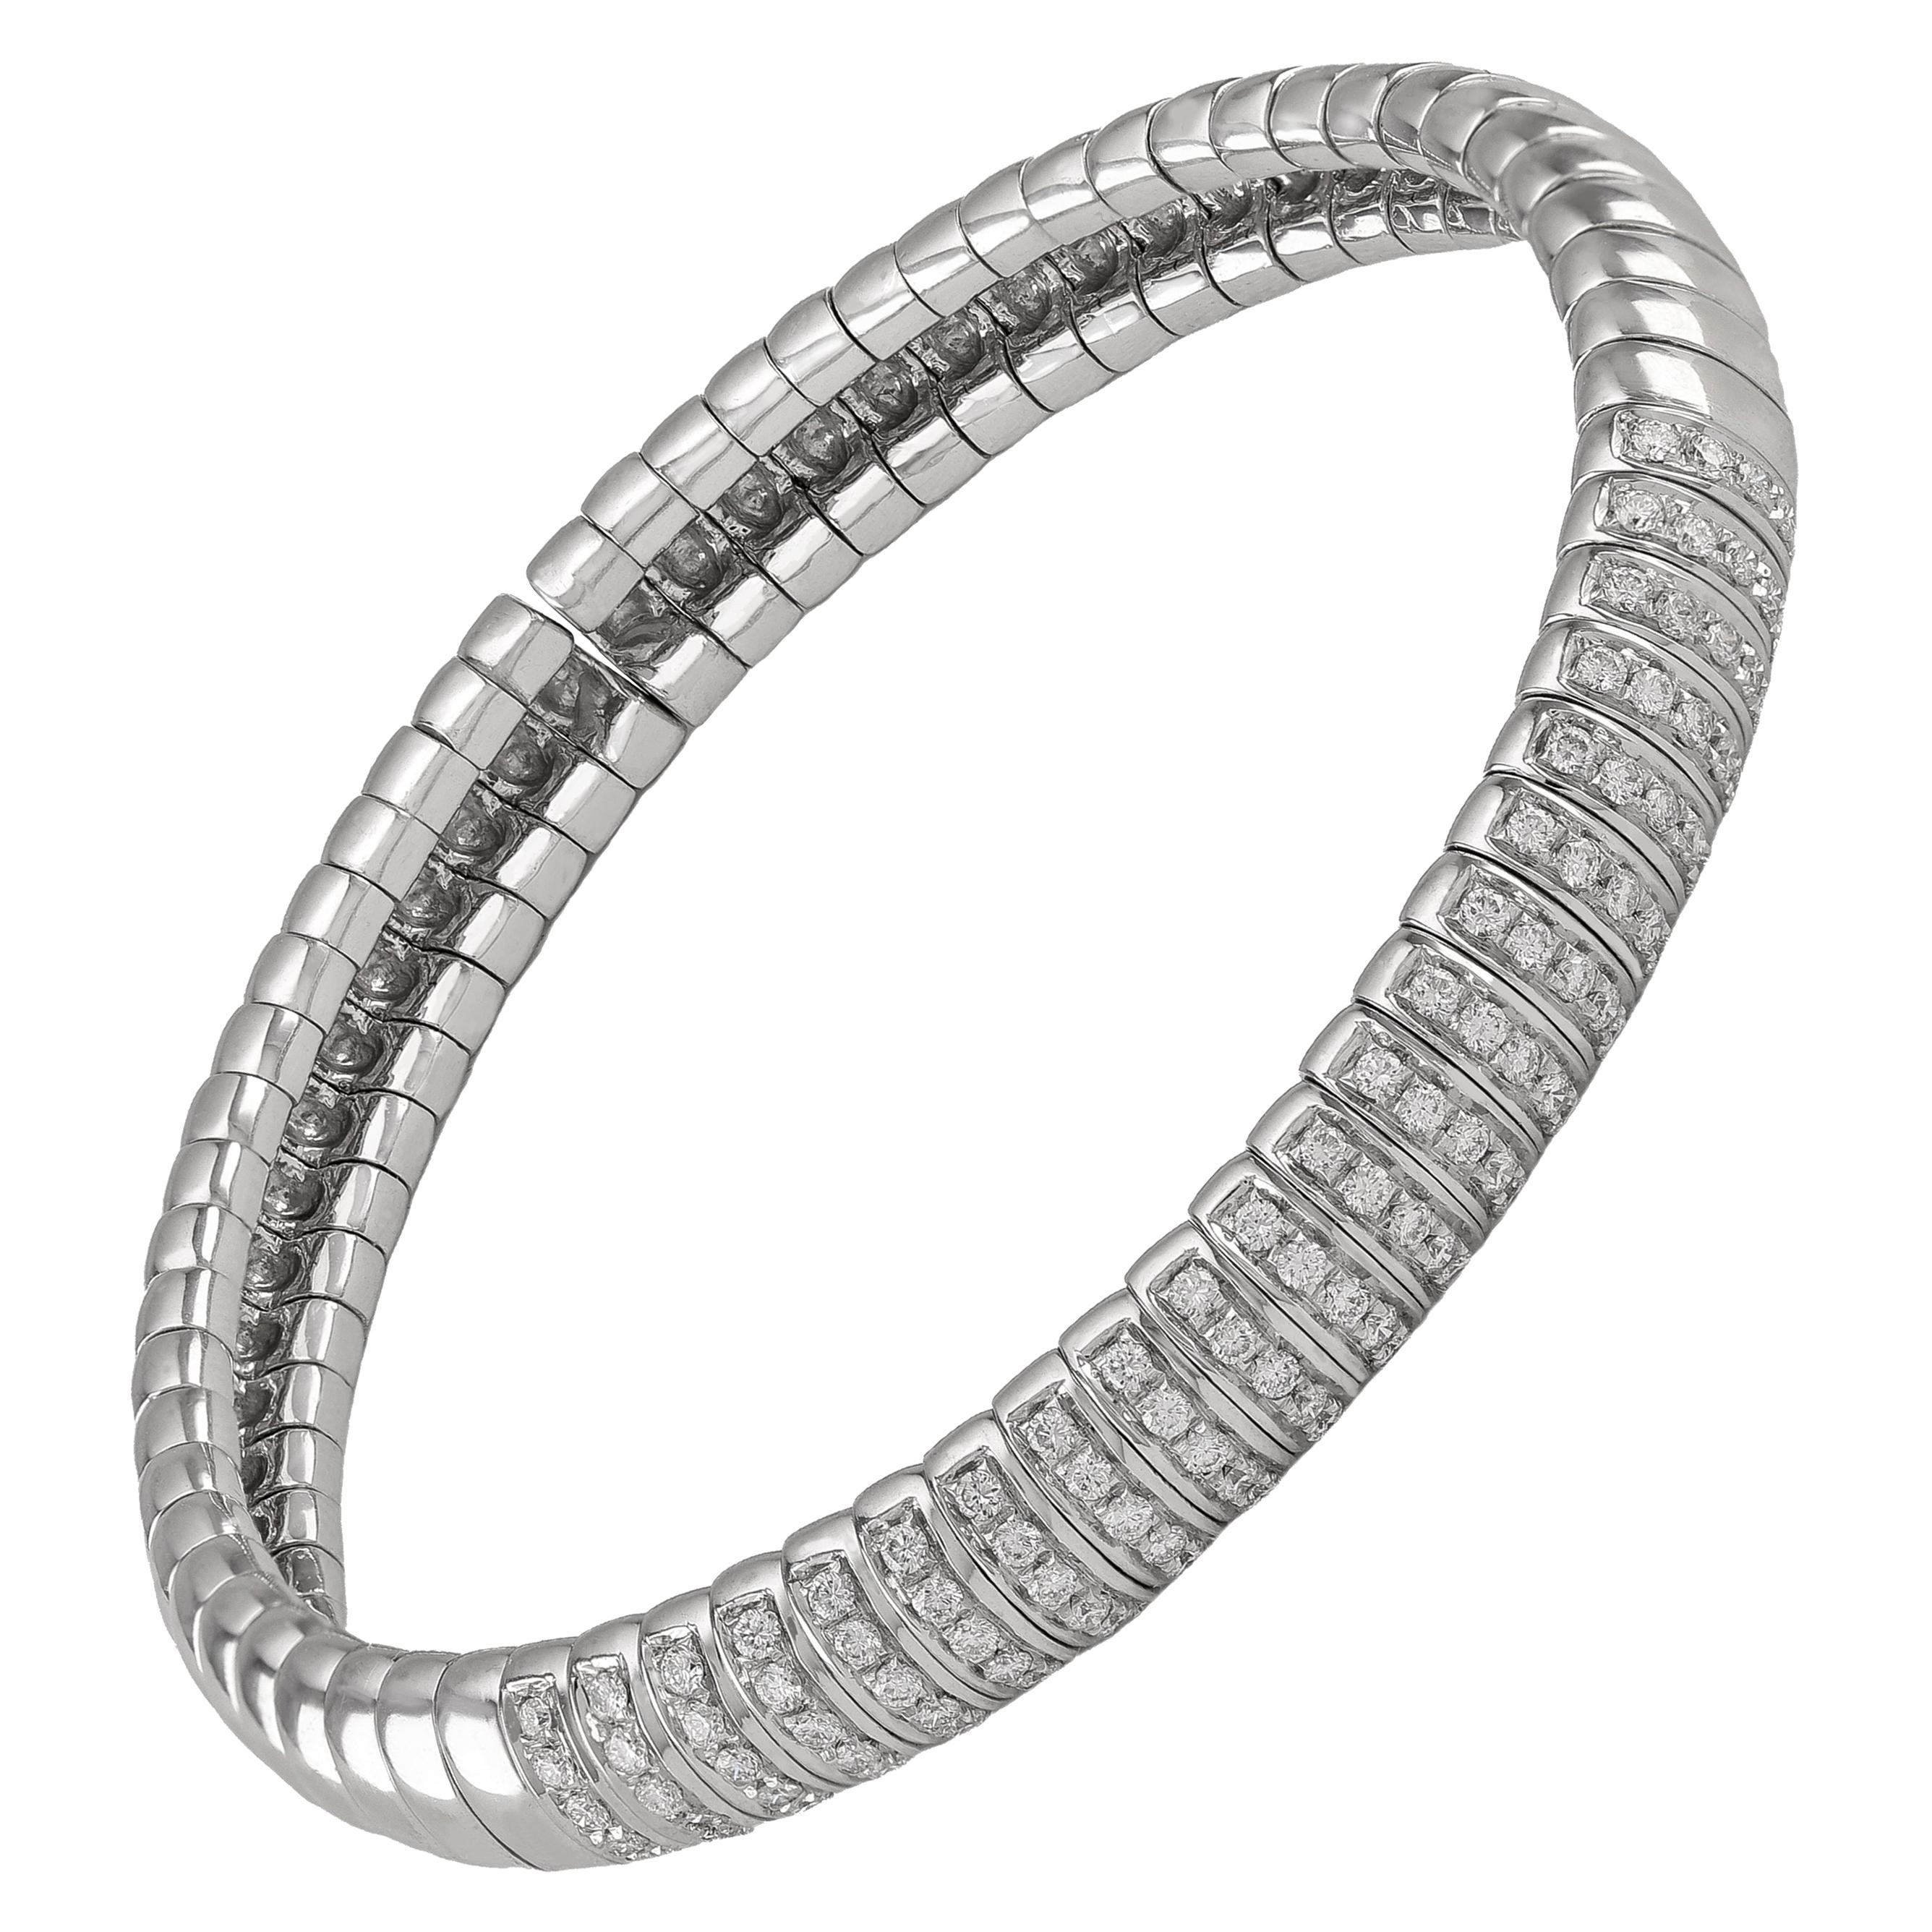 Dome 1.25 Carat Diamond Flexible Cuff Bangle Bracelet